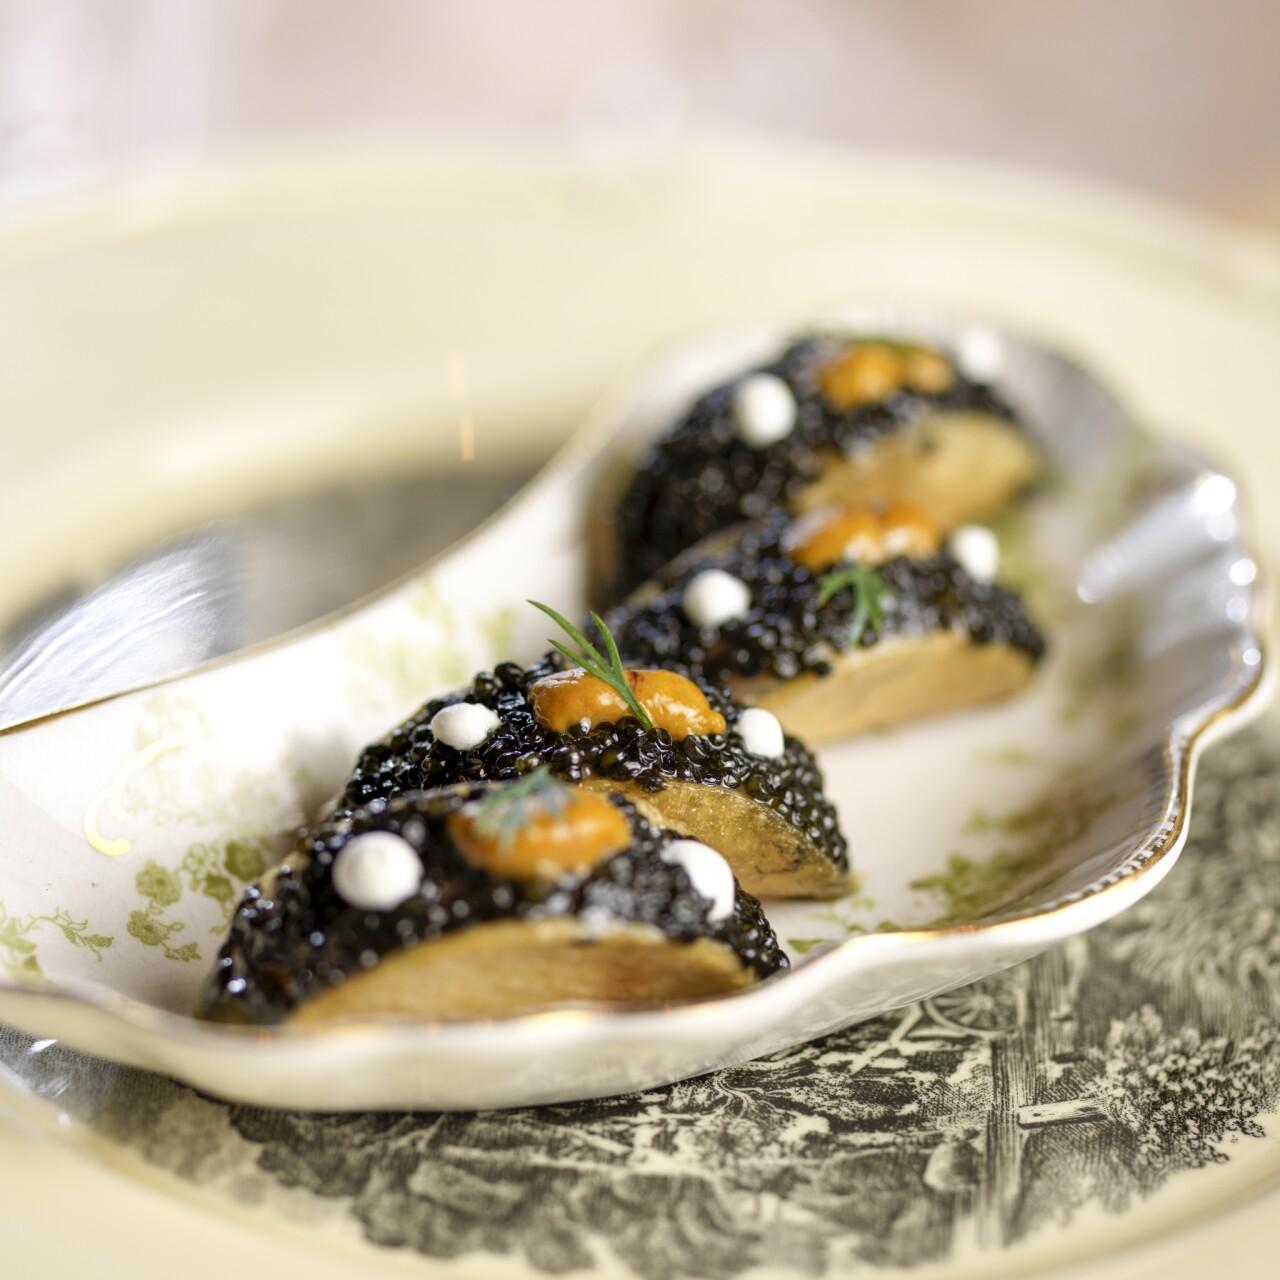 Balsamic caviar